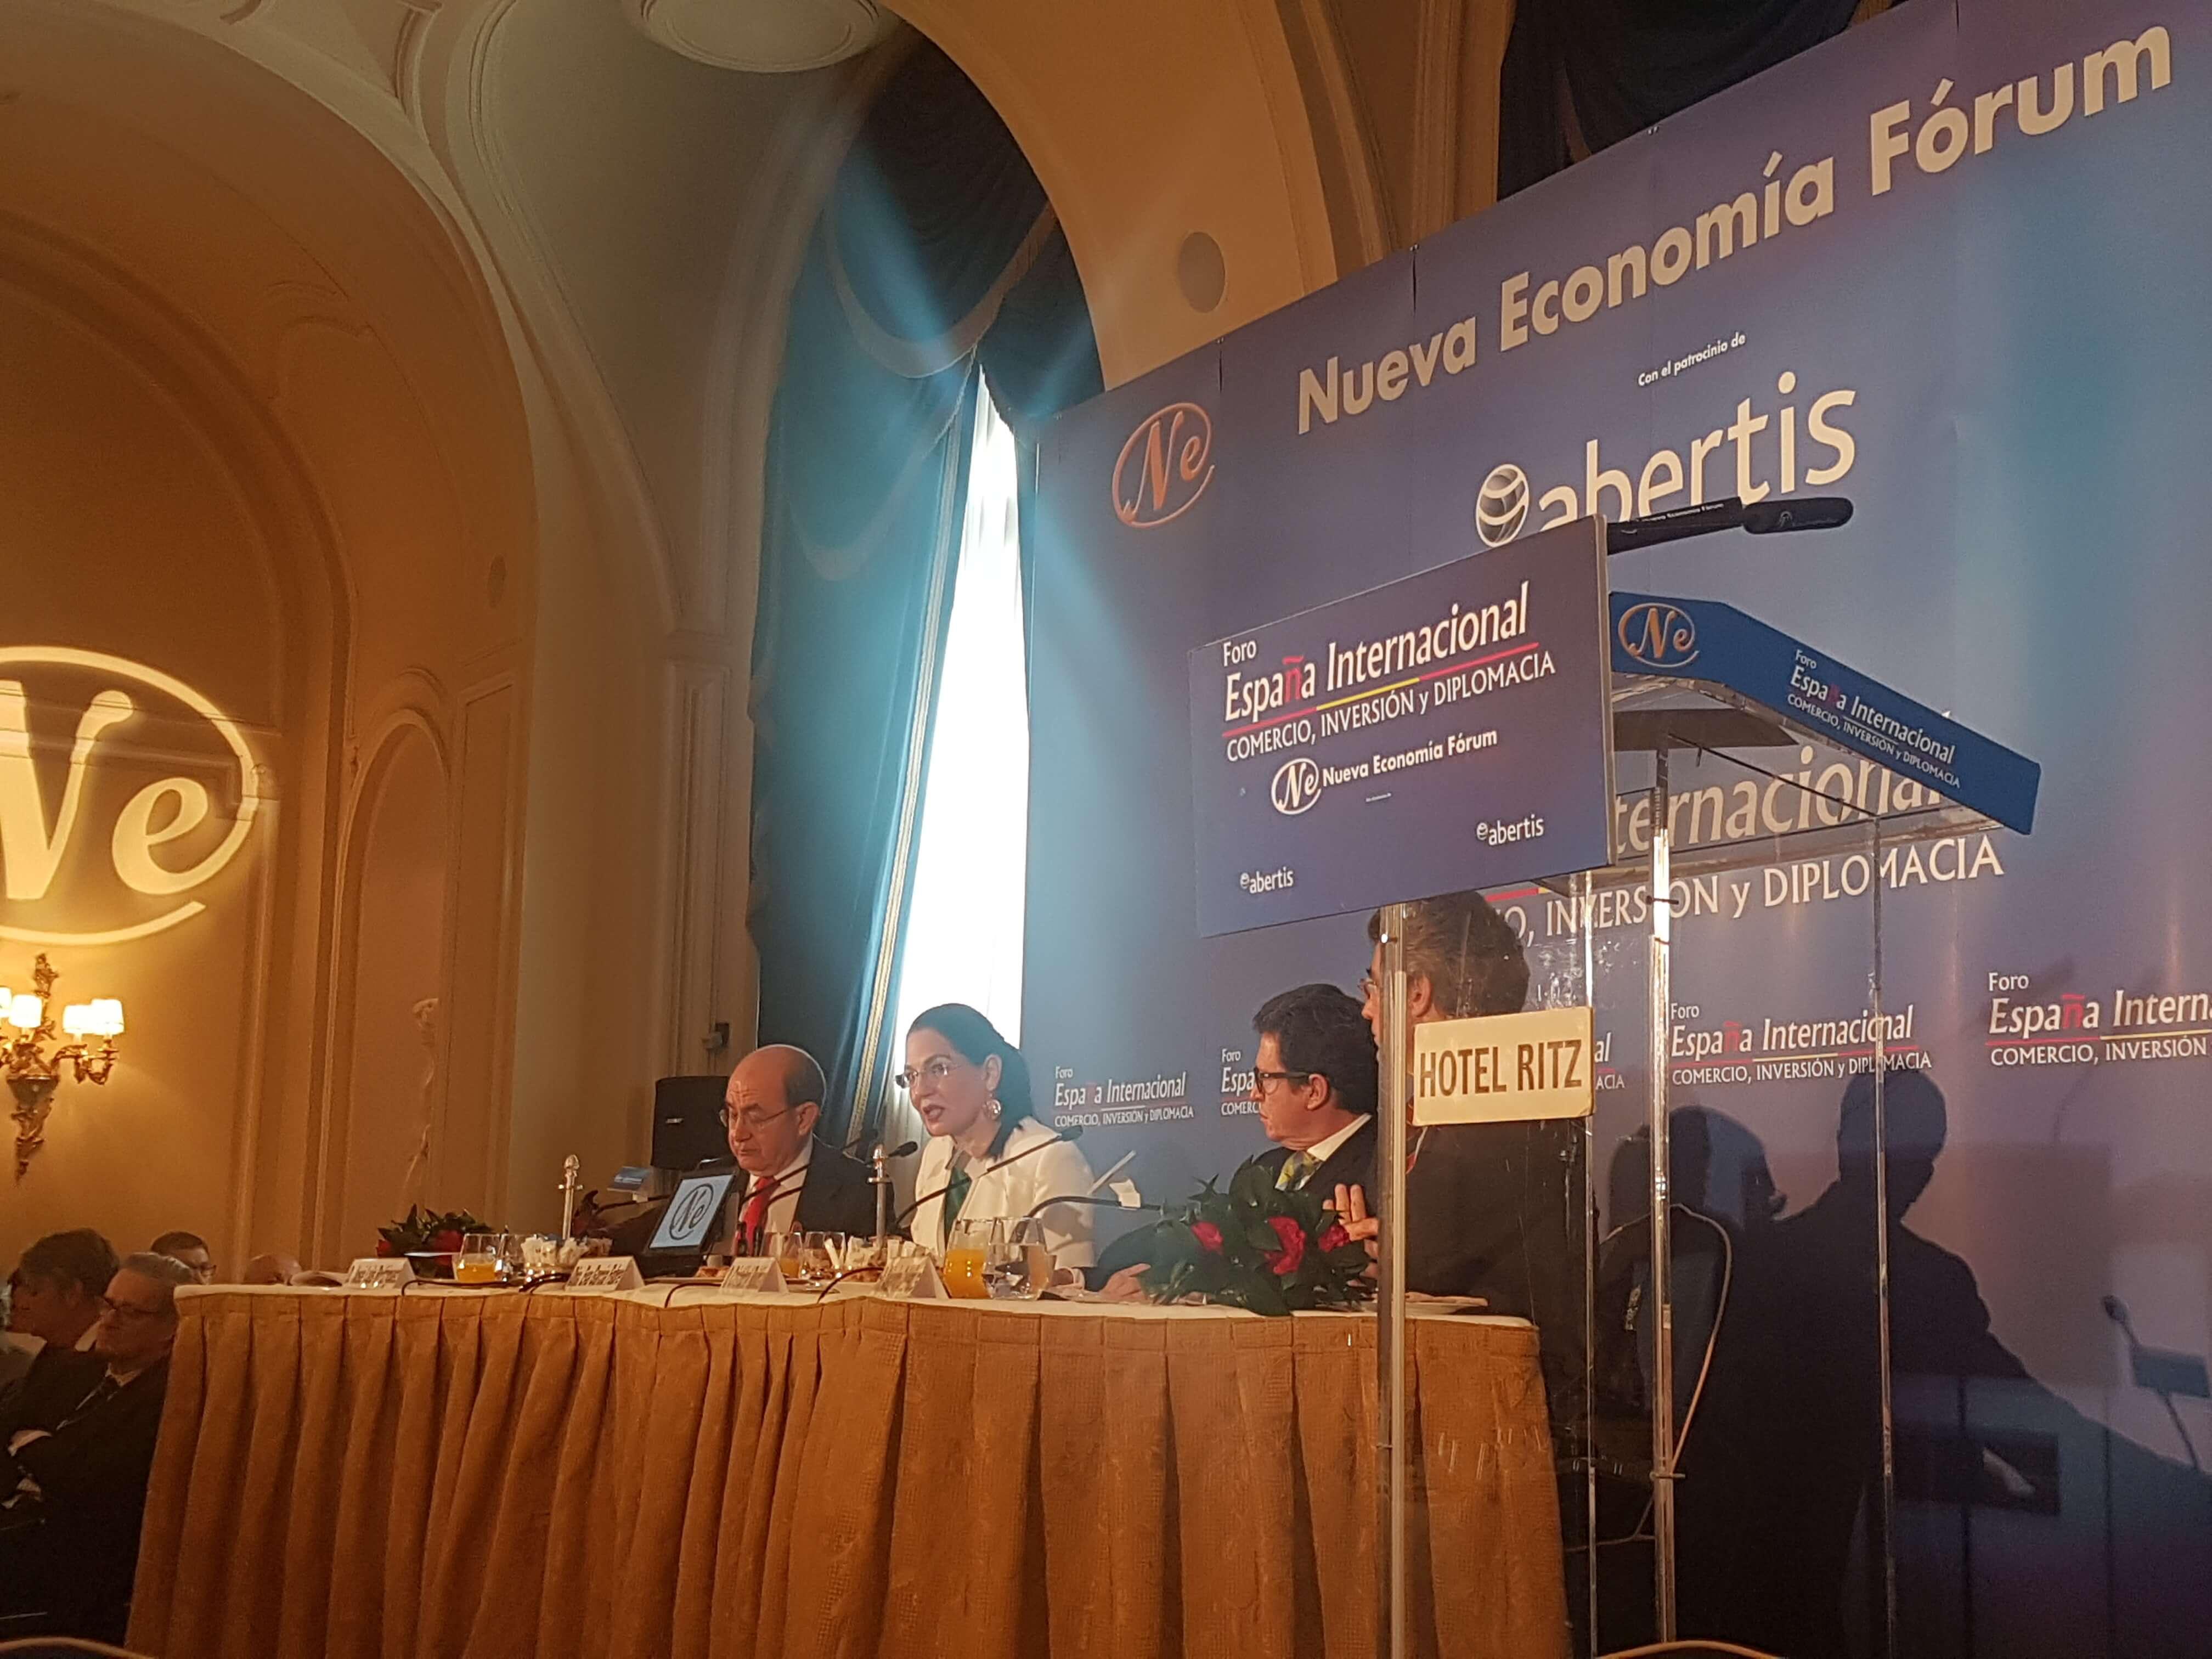 nueva economia forum